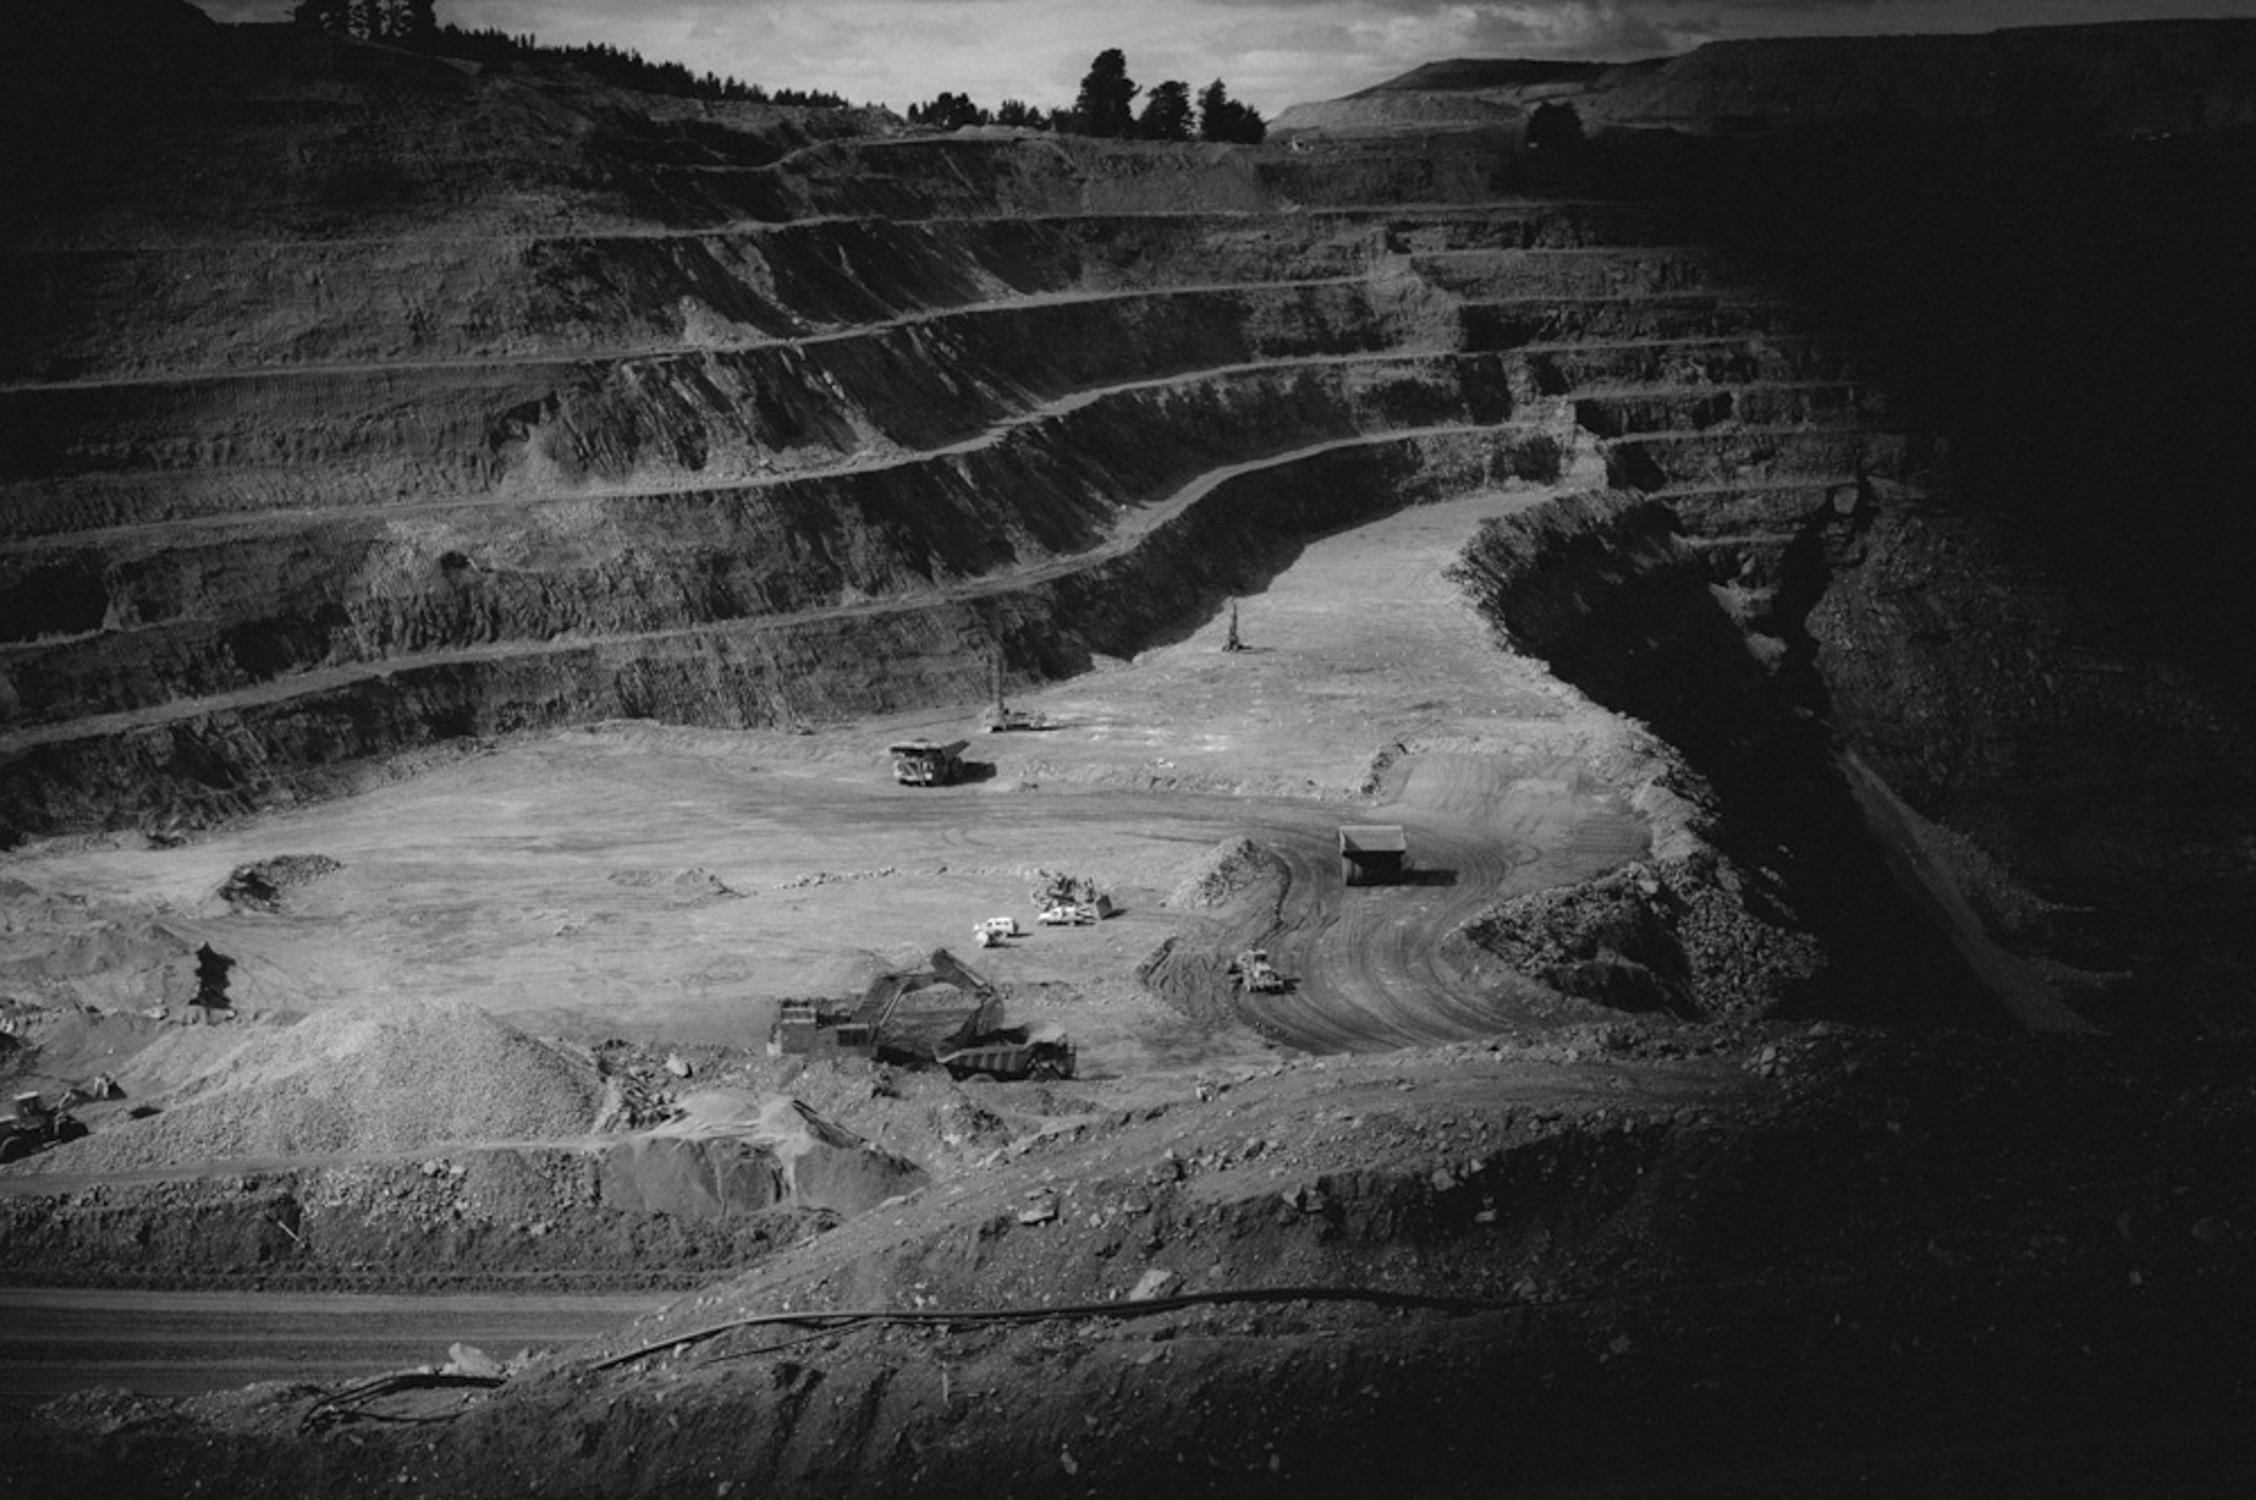 Mining-NewZealand-2016-HEYDT-103.jpg